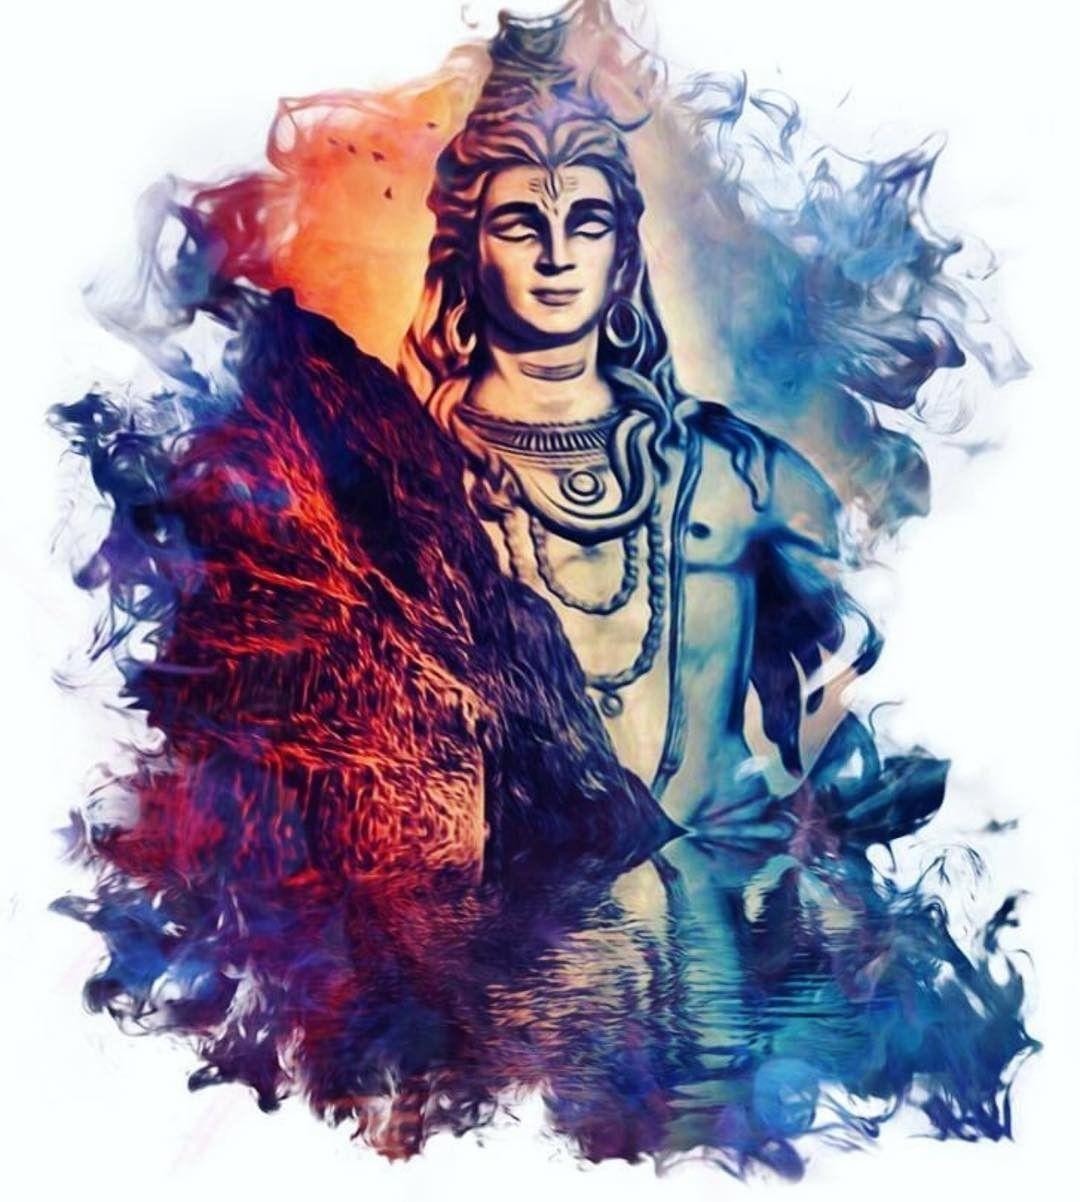 Pin by Hemaambigey on Hero in 2020 Lord shiva, Shiva